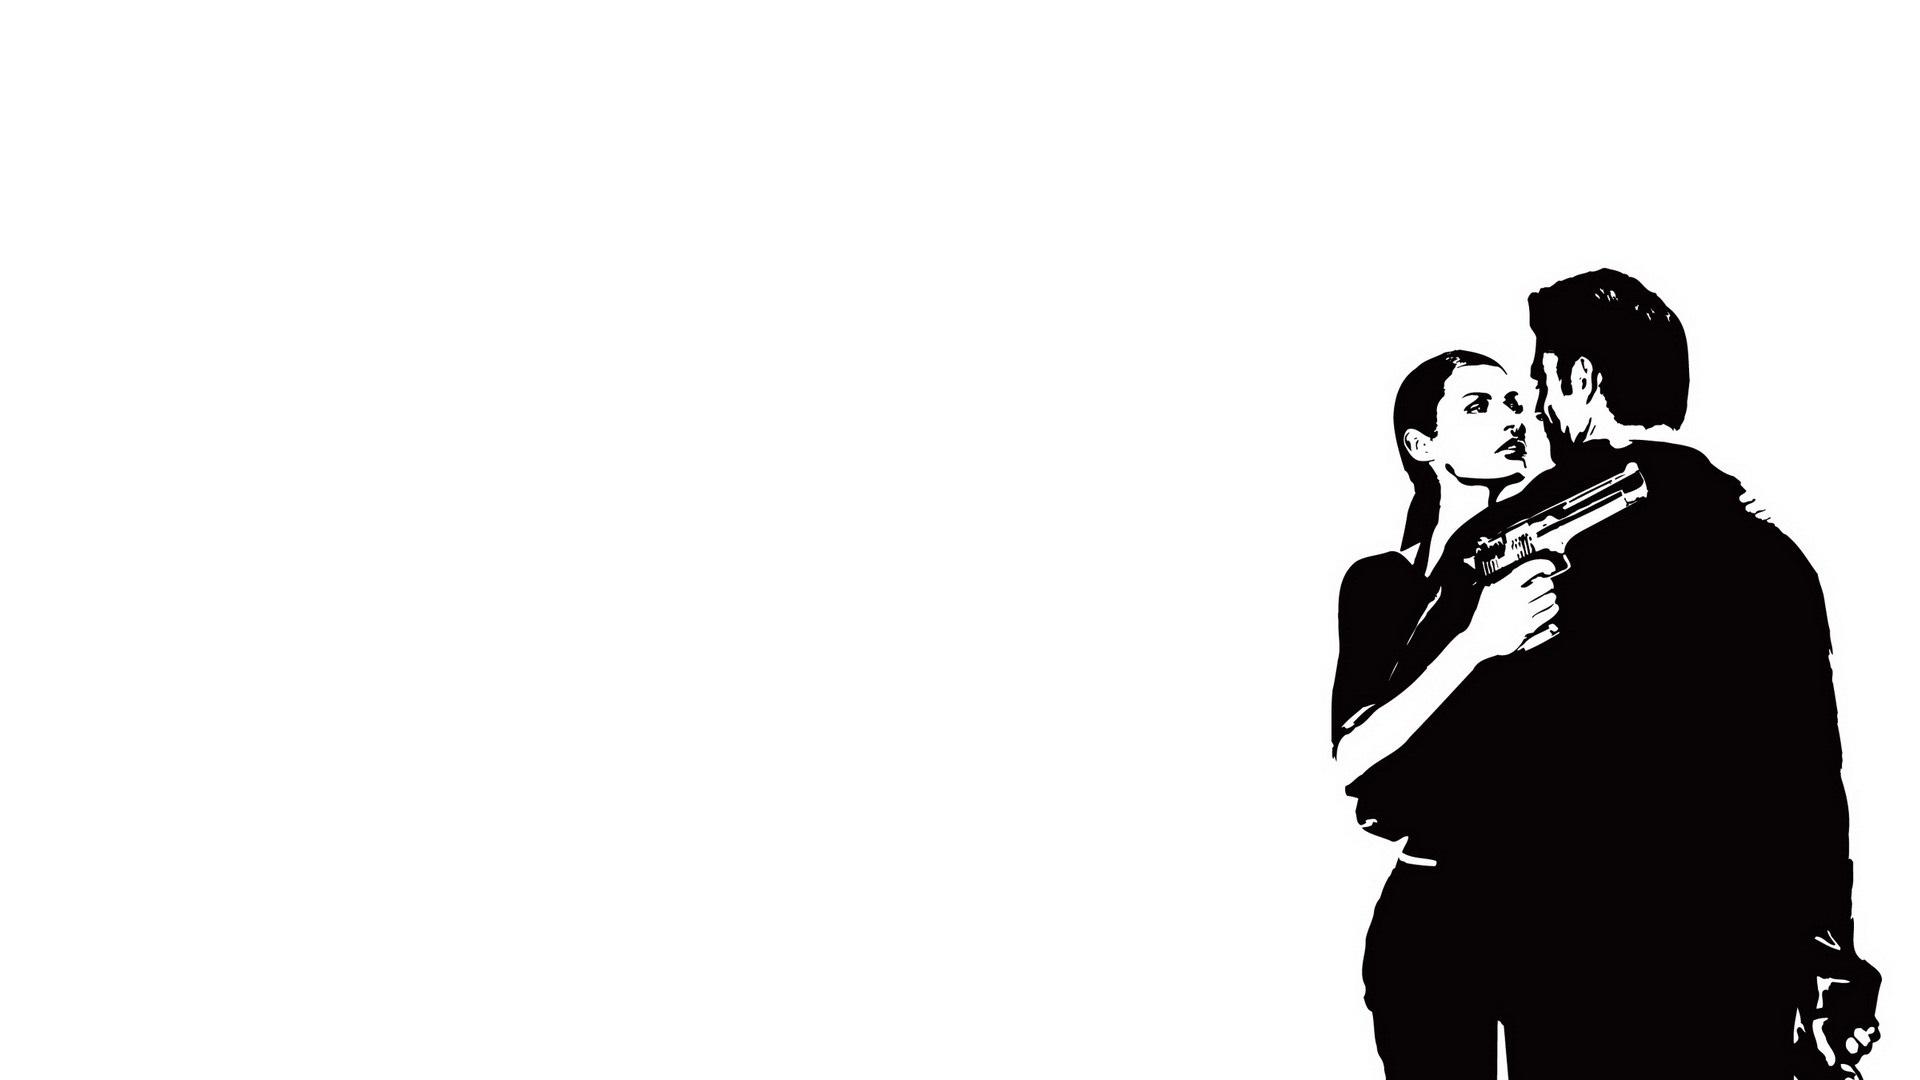 Max Payne 2 The Fall Of Max Payne Wallpaper Download Wallpaper 1920x1080 Max Payne Female Gun Look